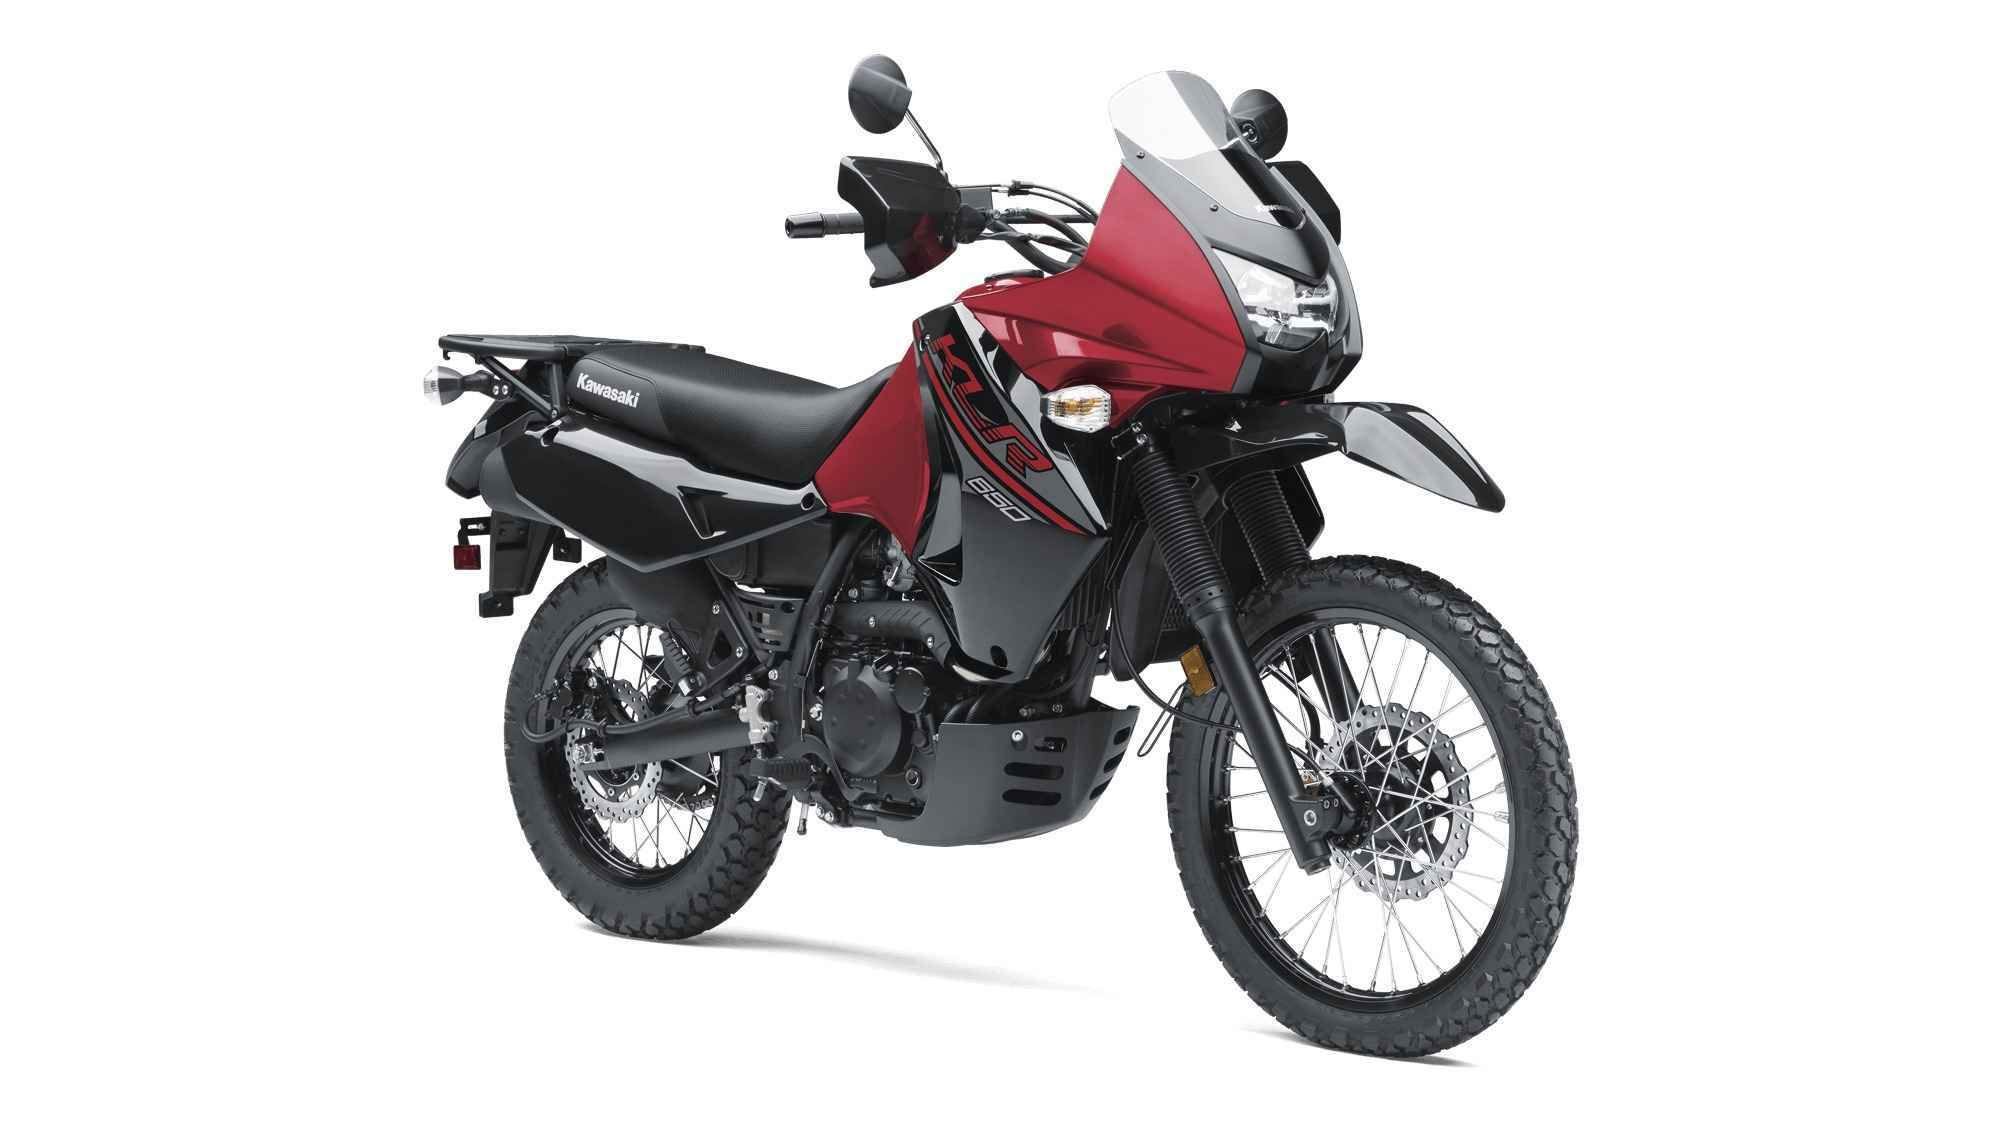 2017 Kawasaki Klr 650 Red